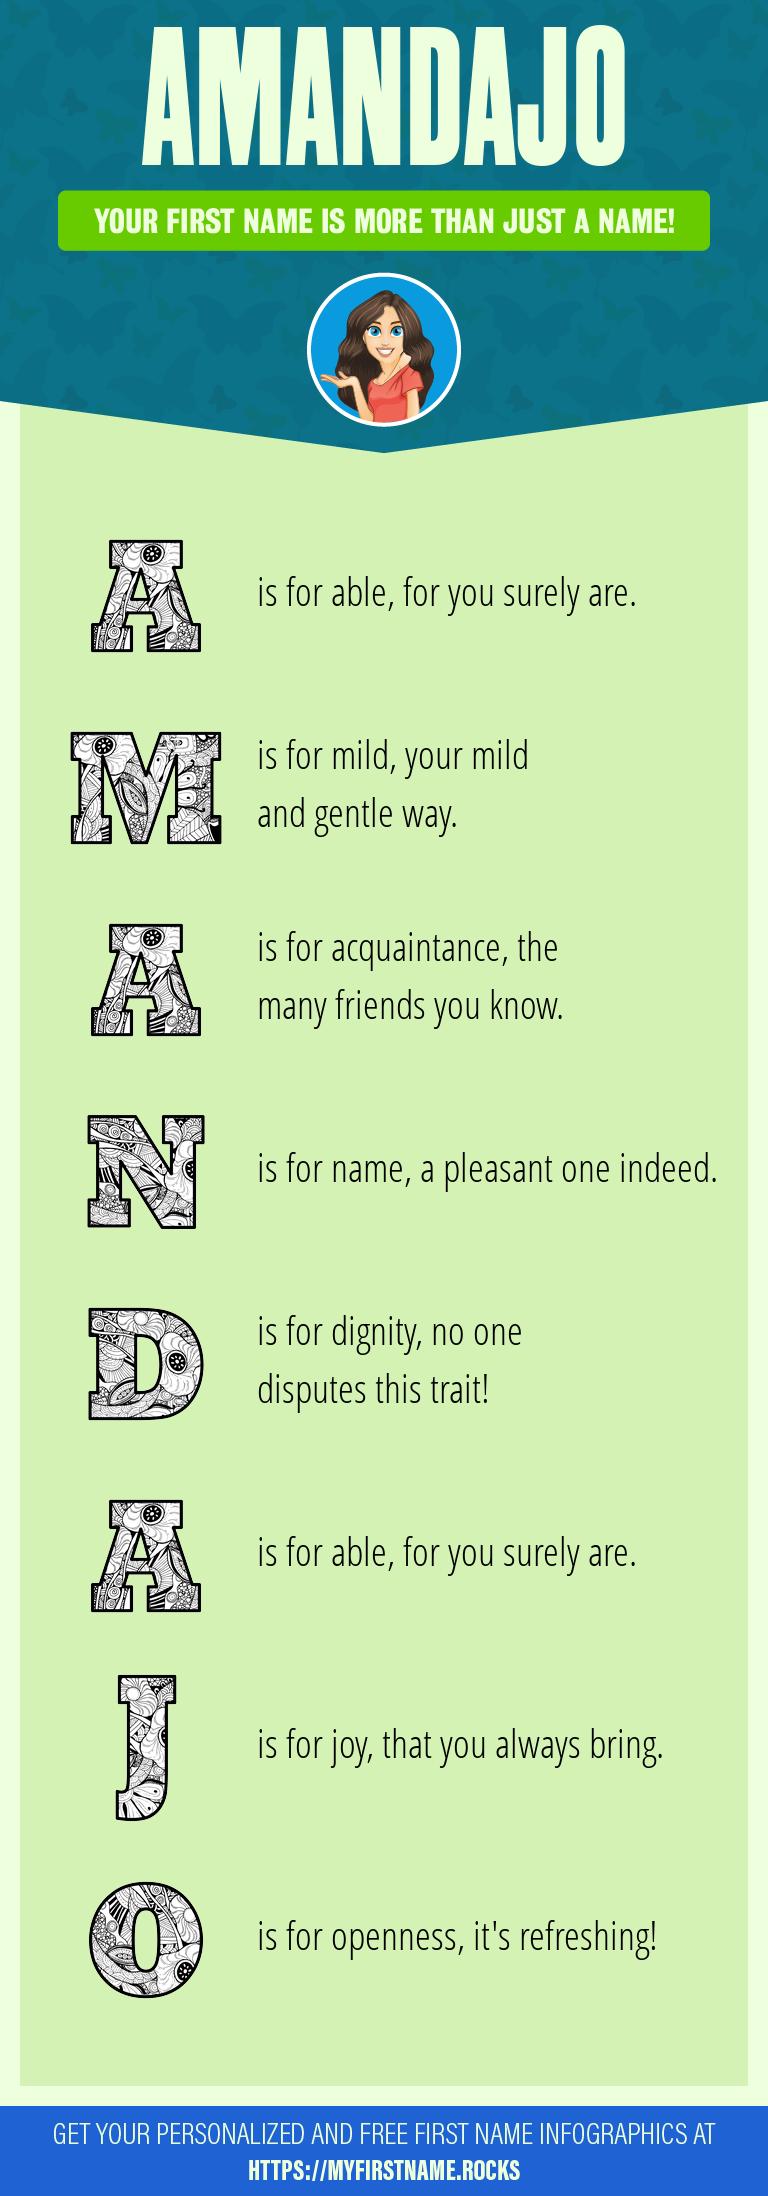 Amandajo Infographics